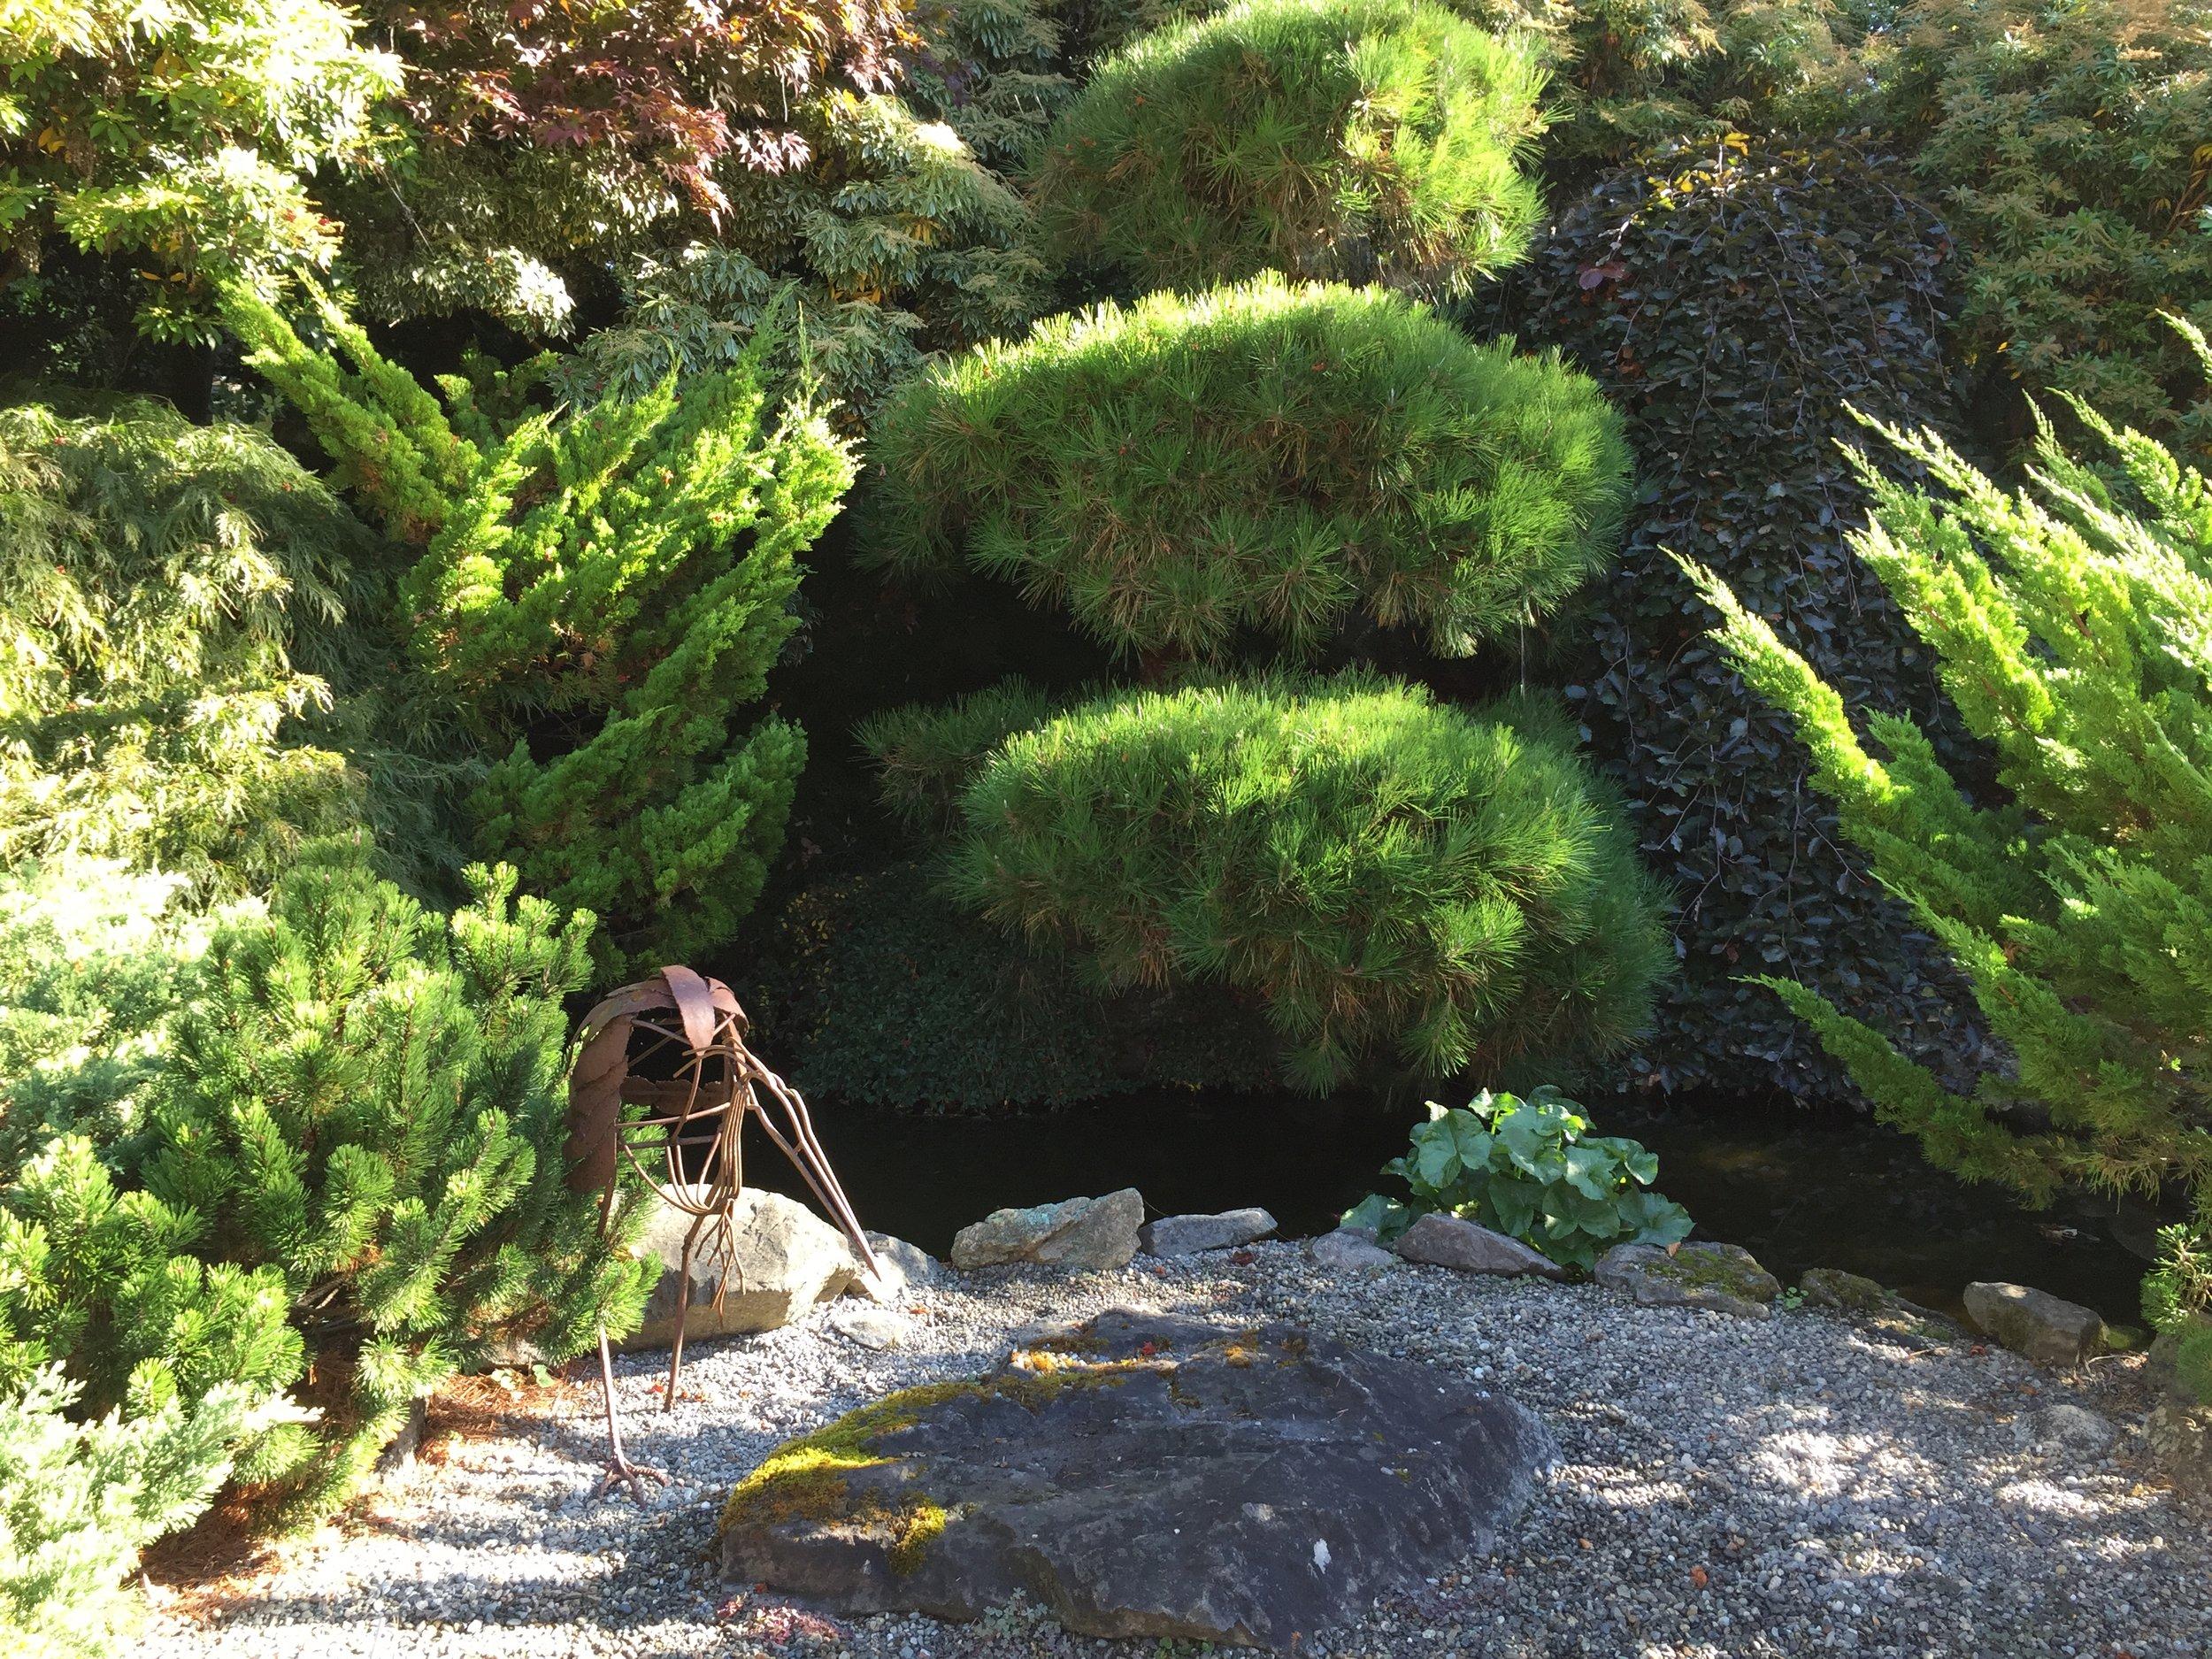 The Kubota-Designed Japanese Garden